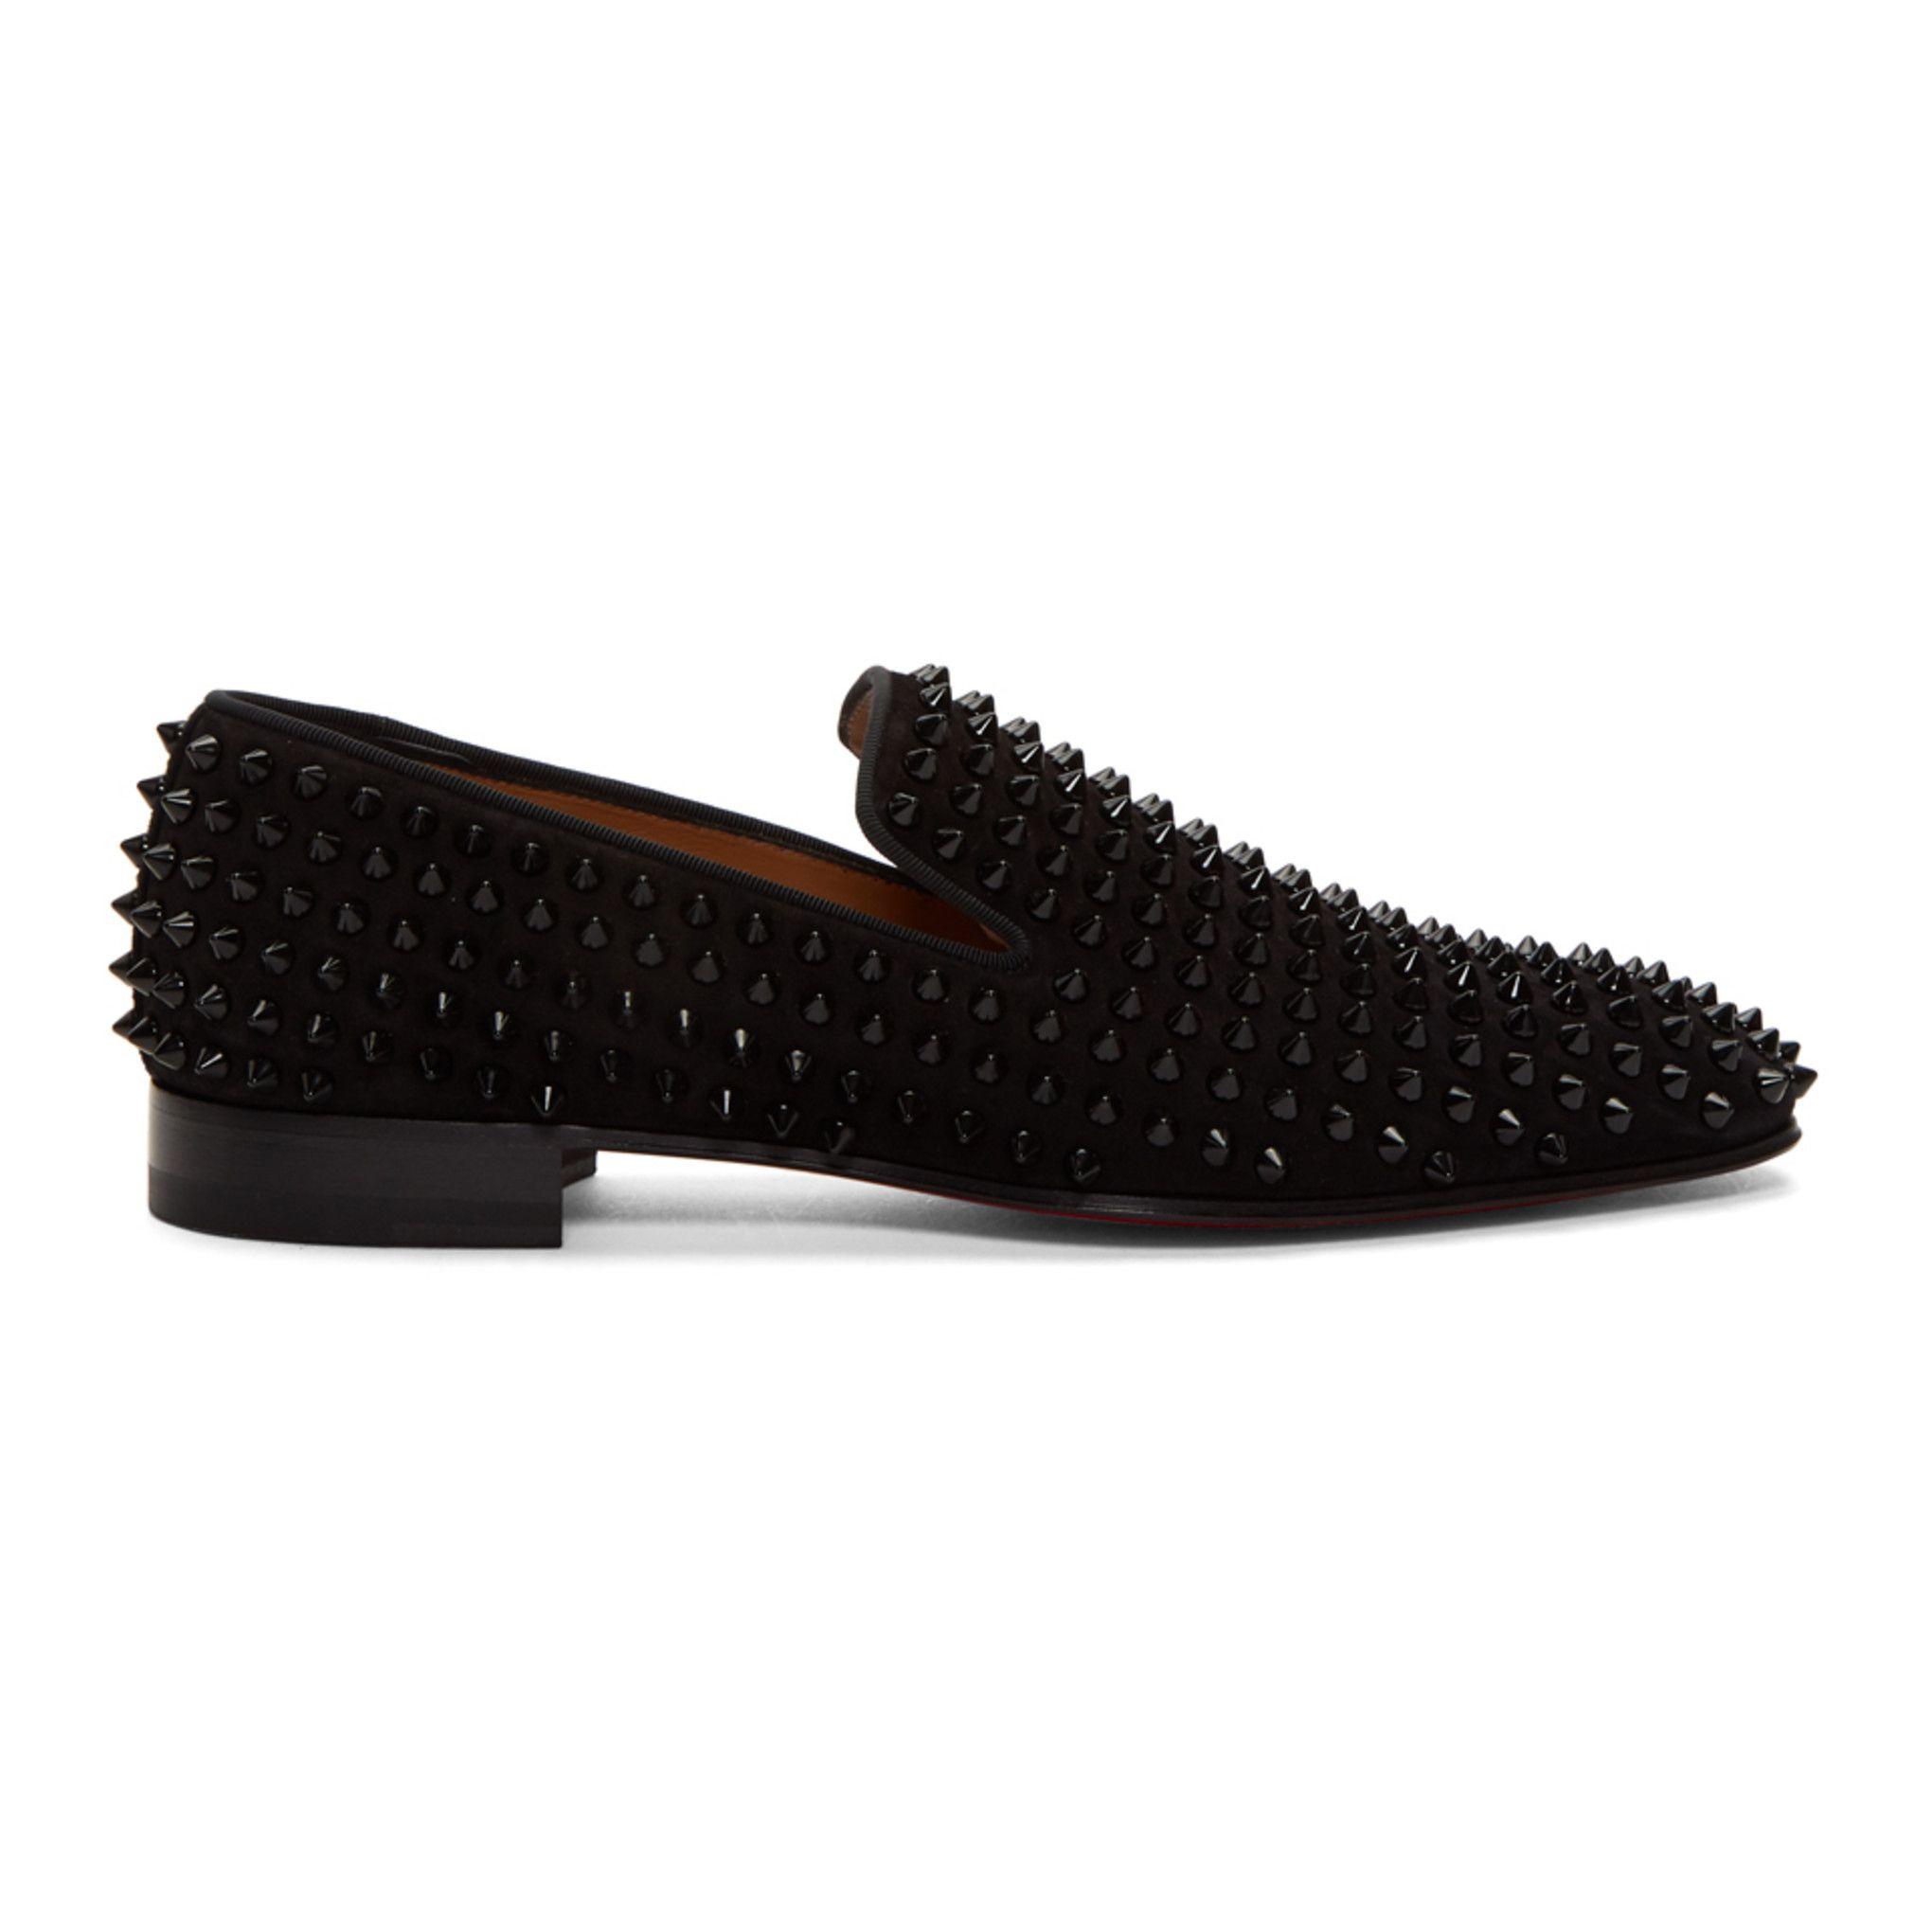 Christian Louboutin Black Dandelion Spikes Loafers Dress Shoes Men Christian Louboutin Loafers Christian Louboutin [ 2040 x 2040 Pixel ]